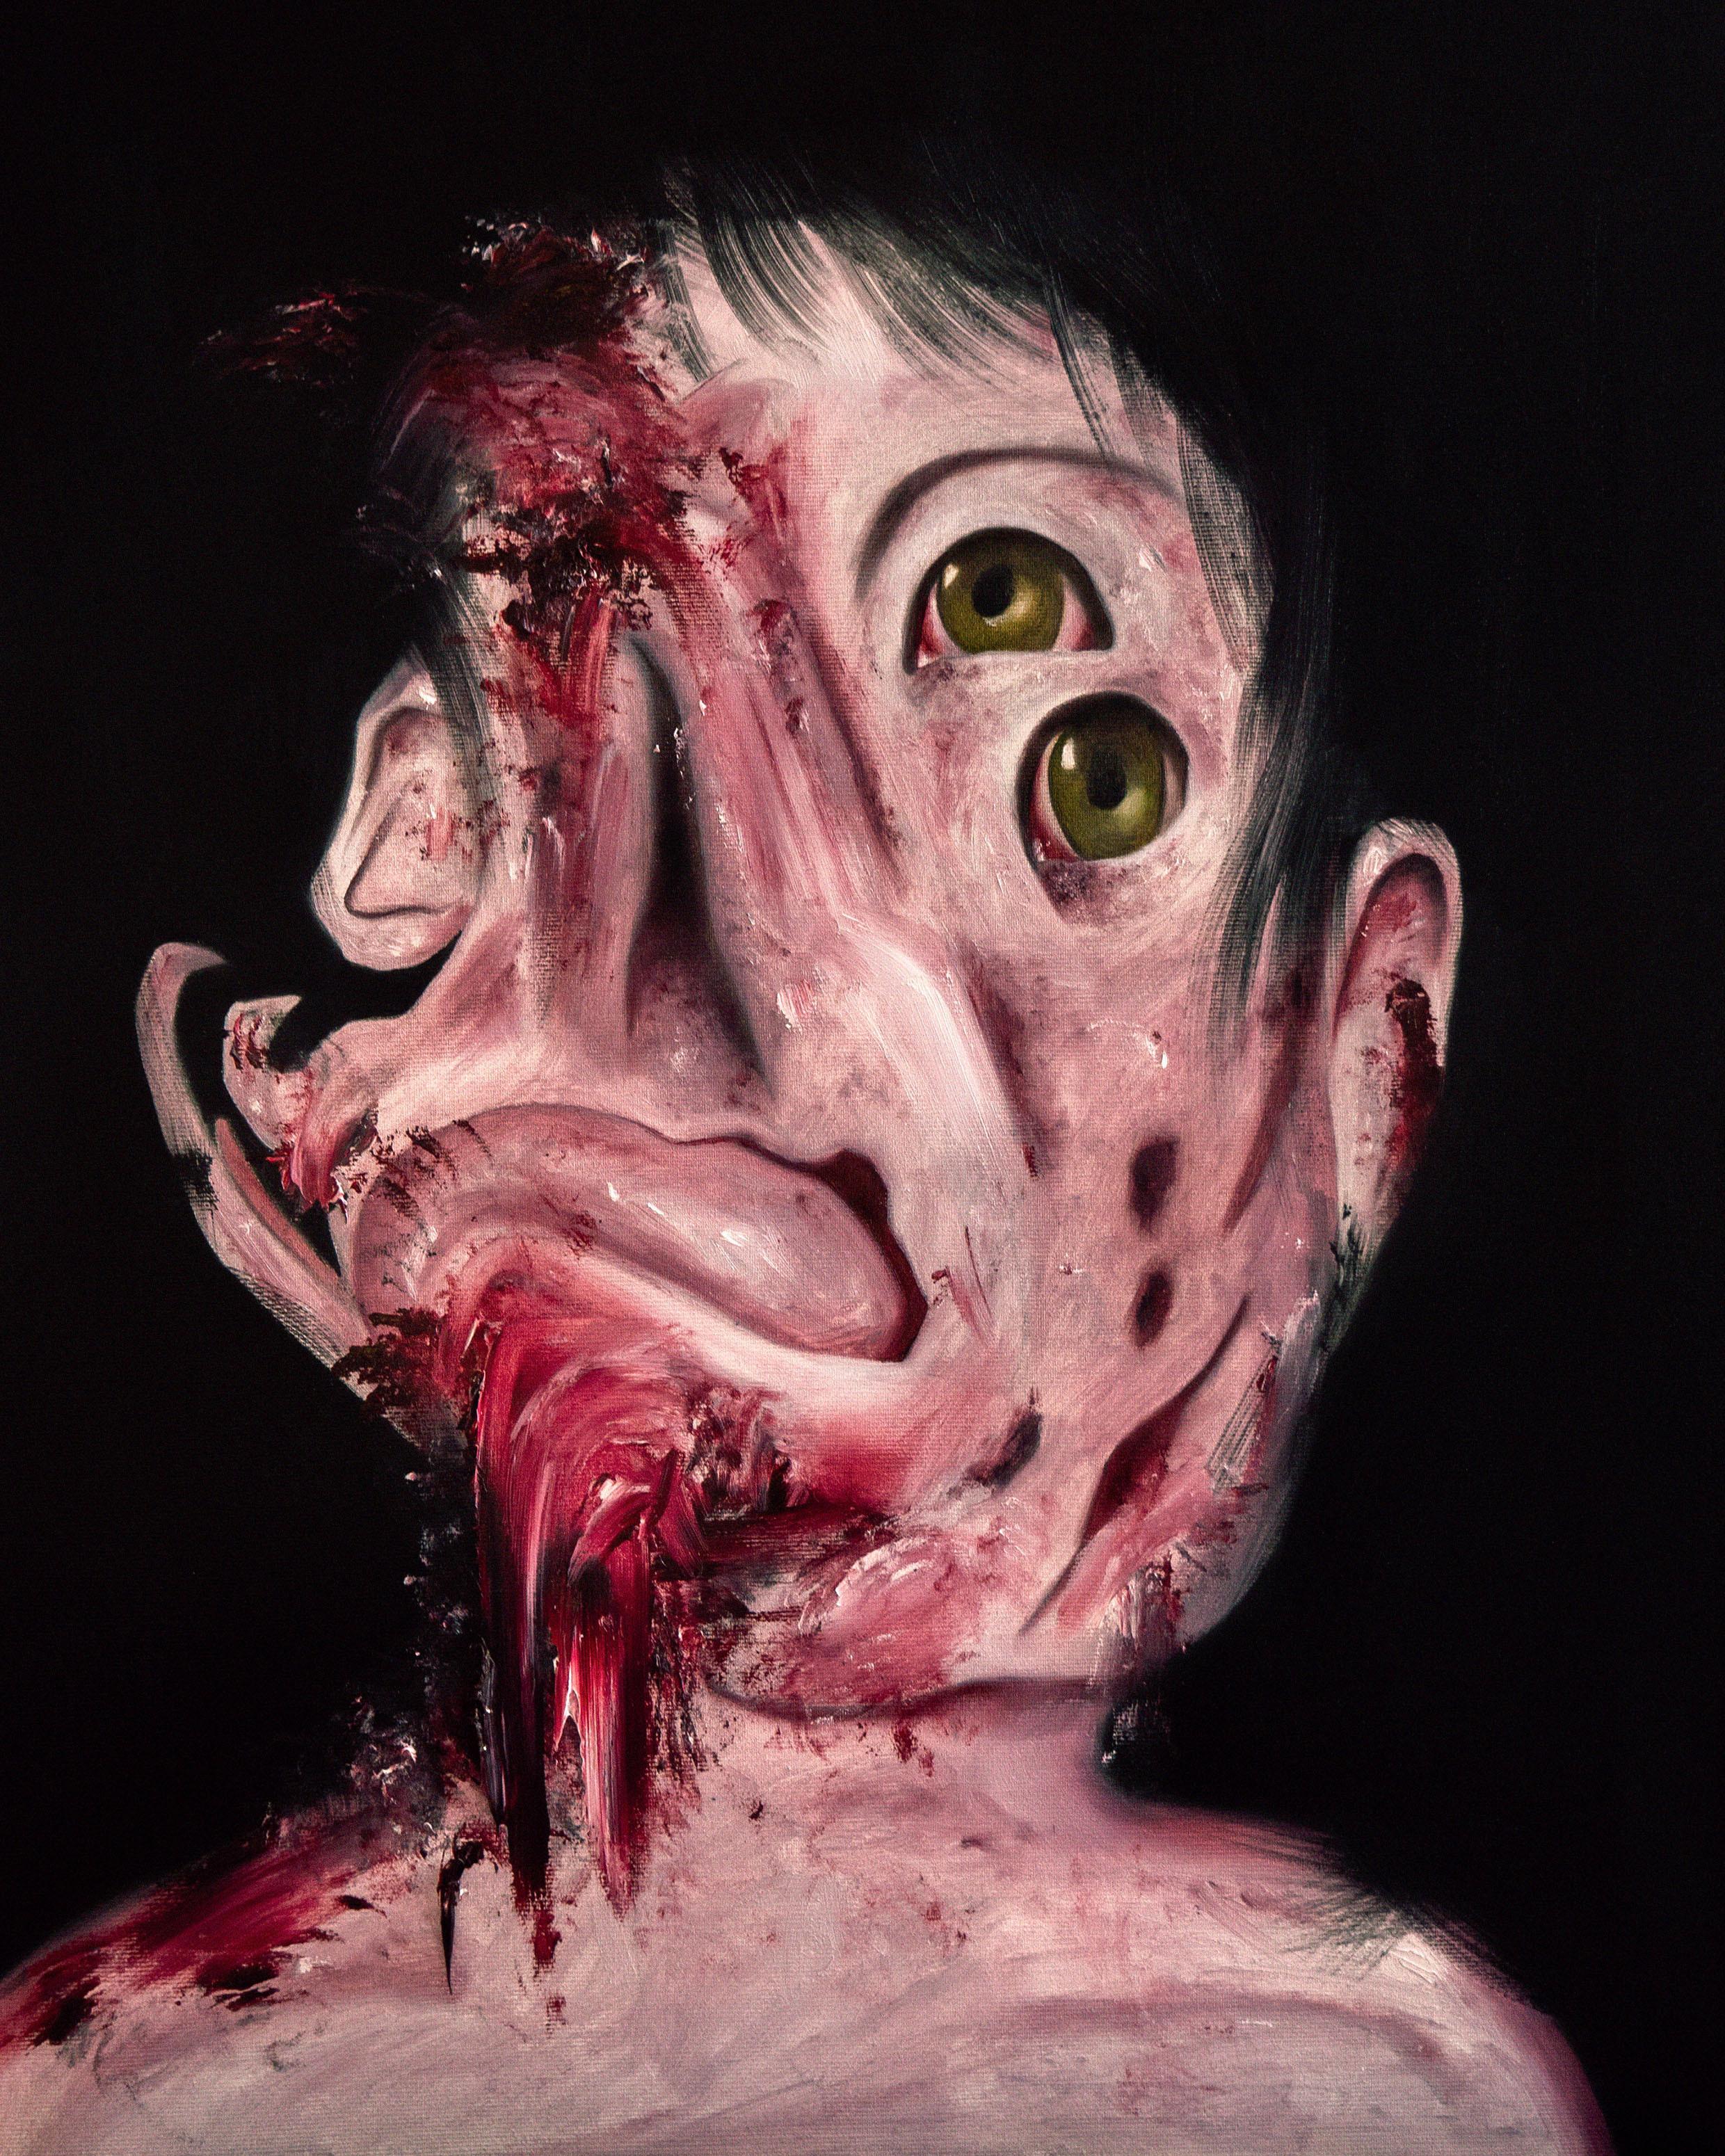 Oil on canvas – 60 x 50 cm.